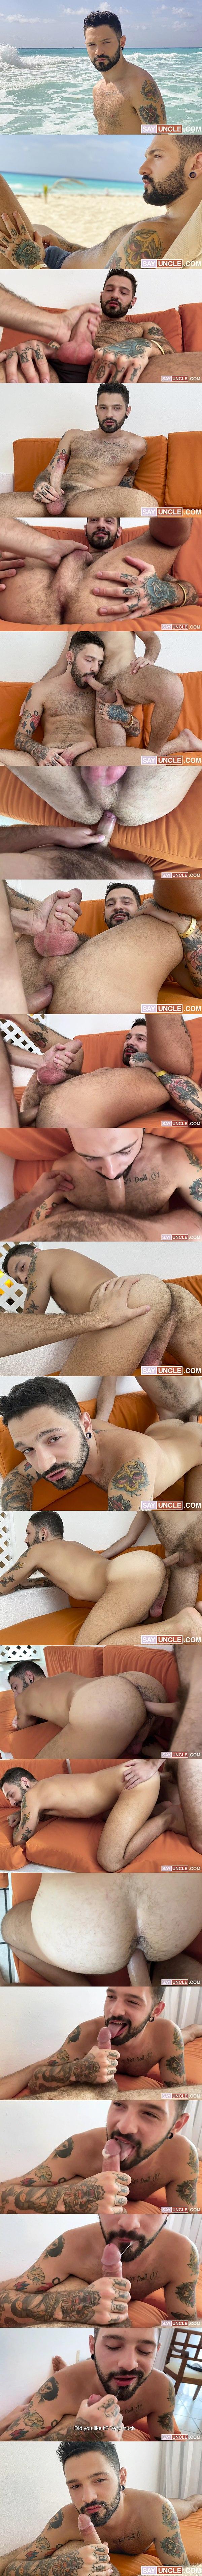 Latinleche - the camera guy Rob Campos barebacks fuzzy Brazilian jock Igor Lucios in a POV scene before he nuts in Igor's mouth in When Brazil Meets Argentina 02